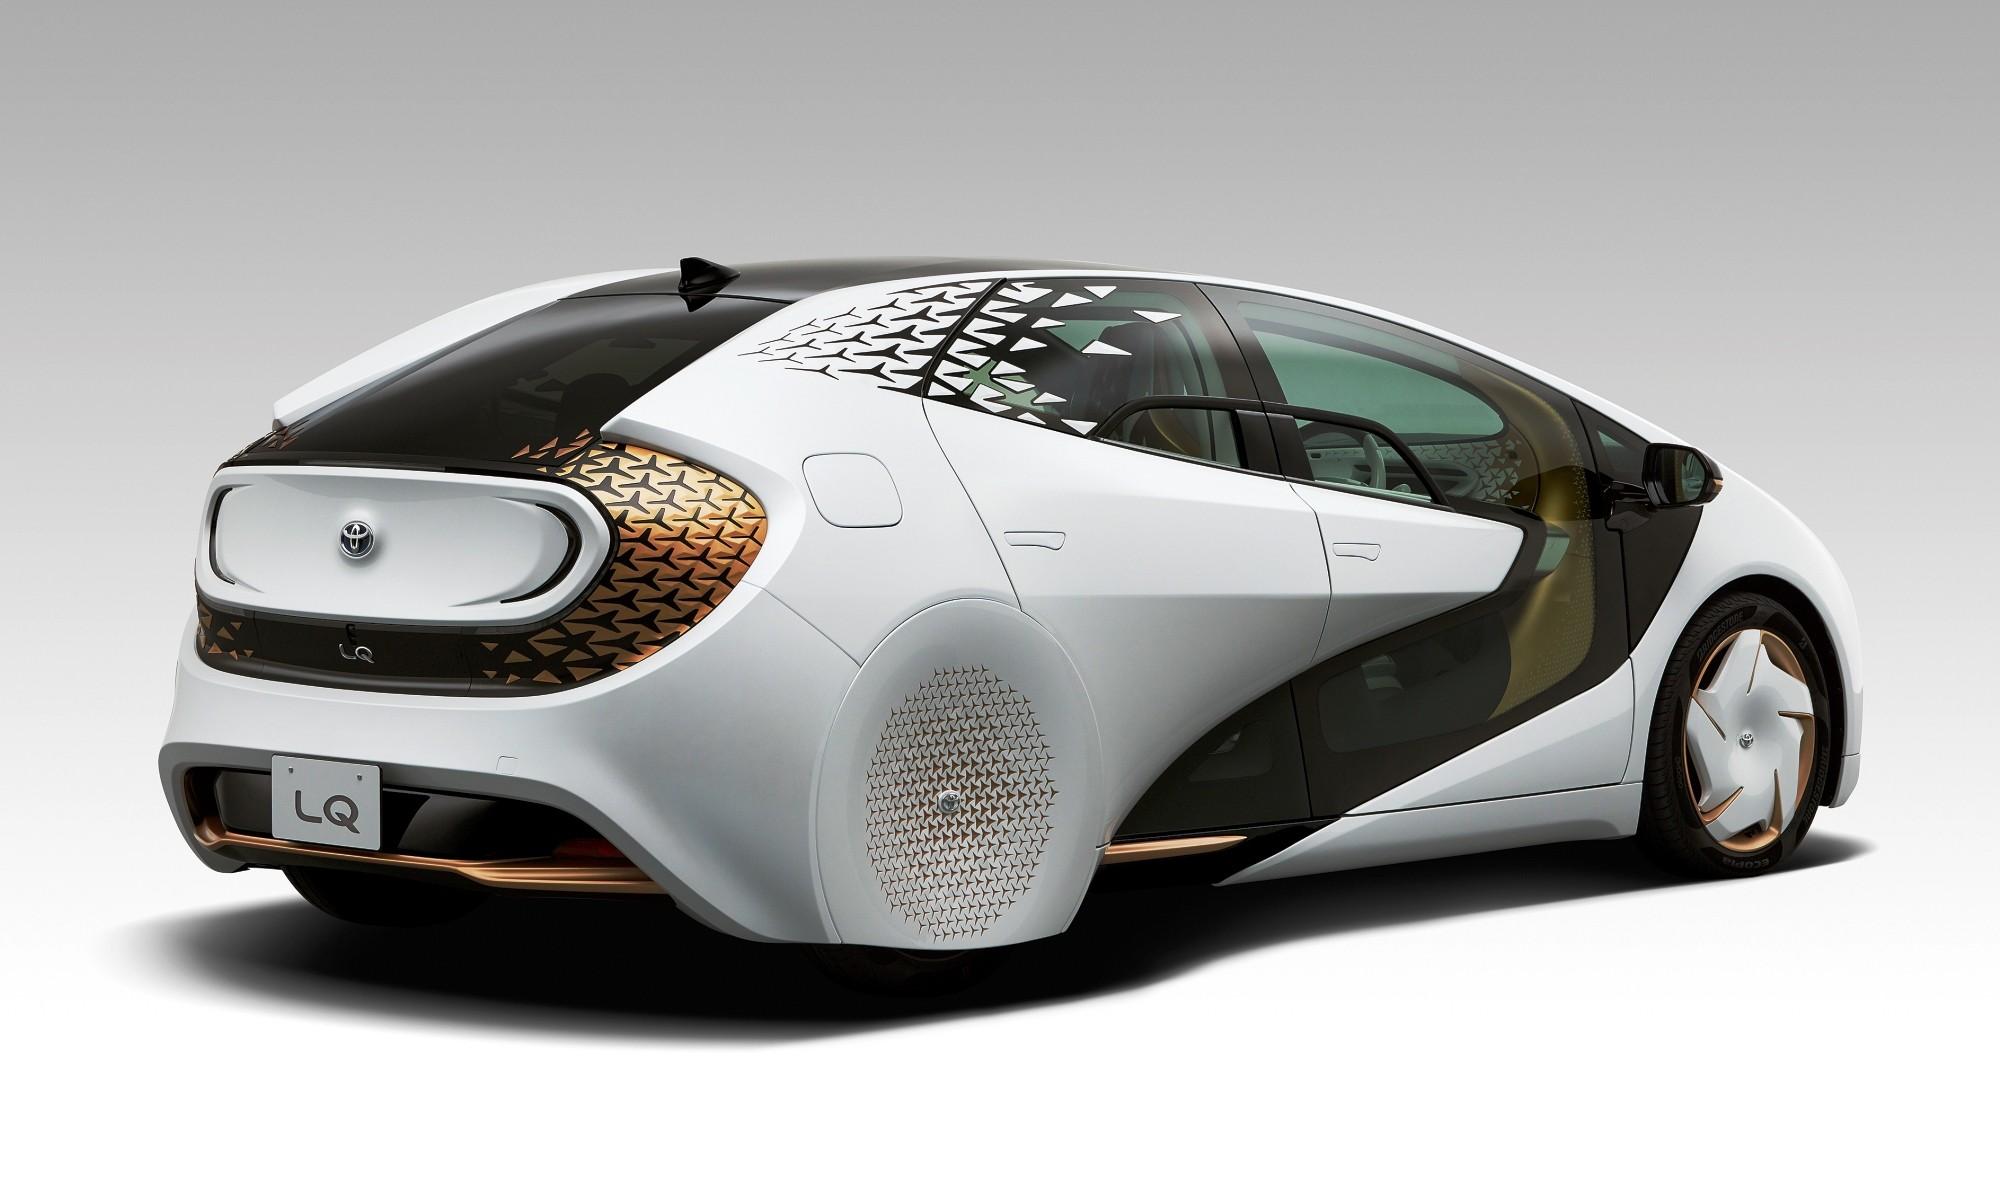 Toyota LQ rear